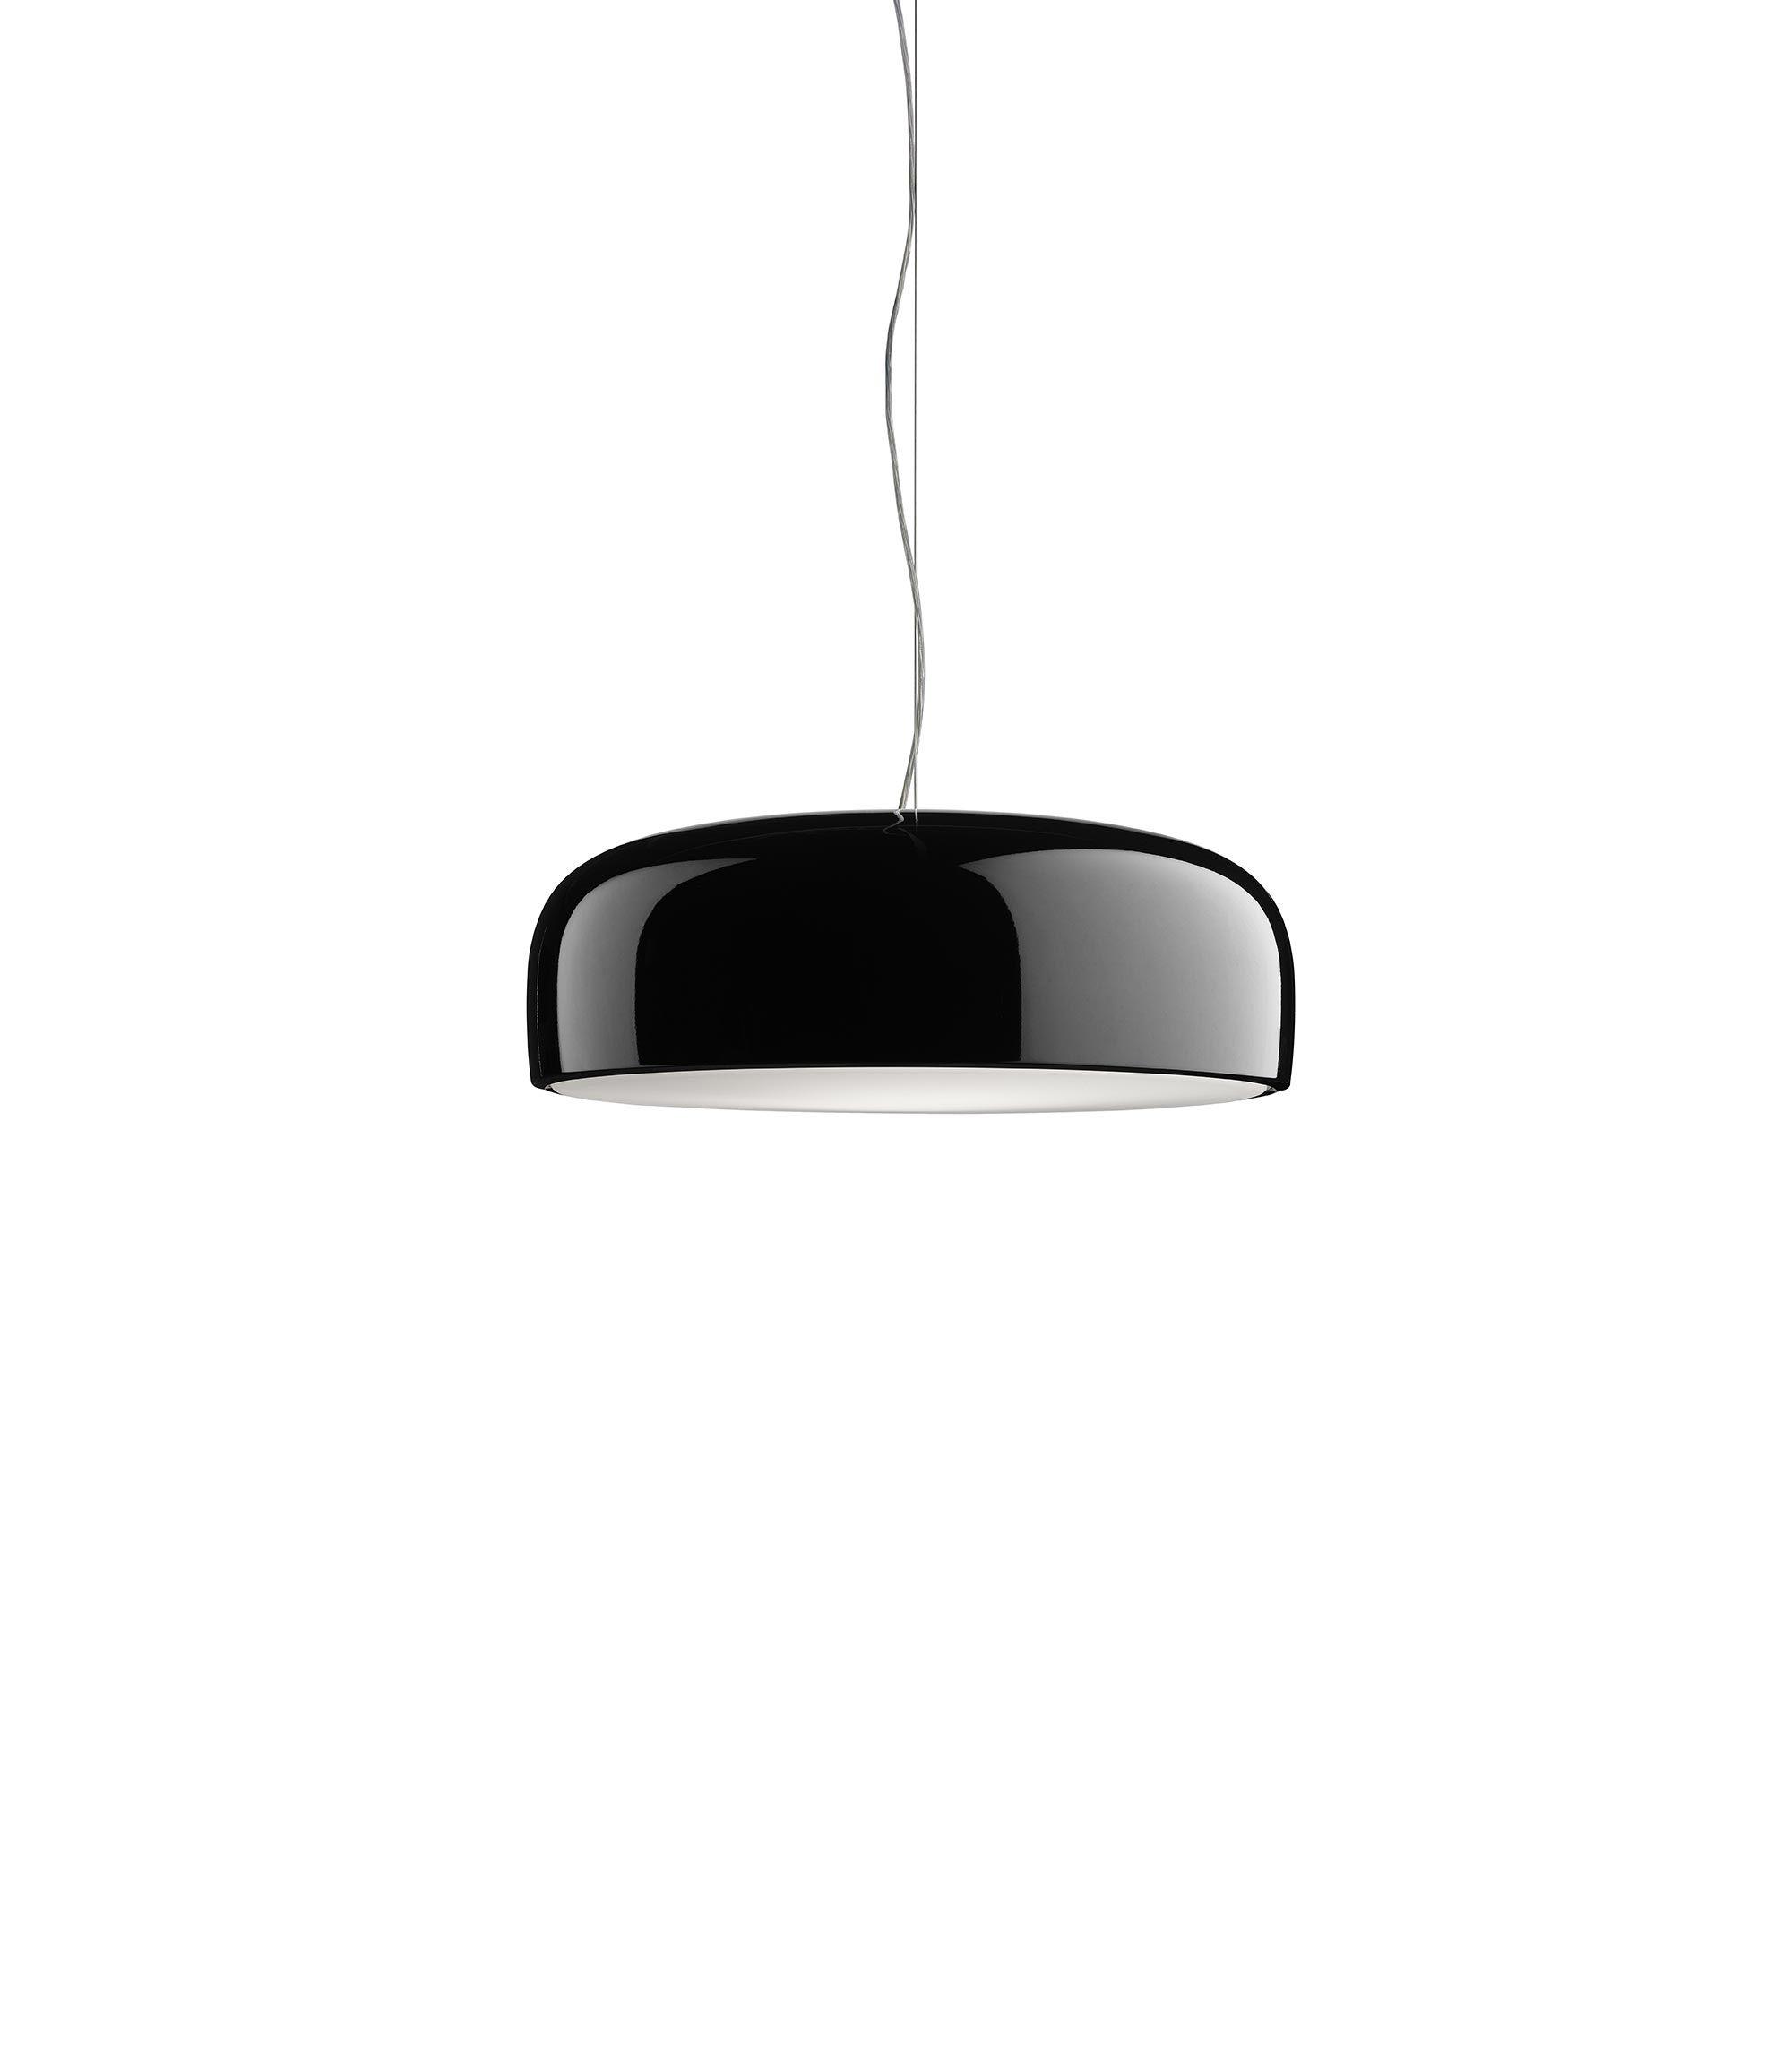 Smithfield Suspension Lamp Lampade Lampade A Sospensione Lampadari